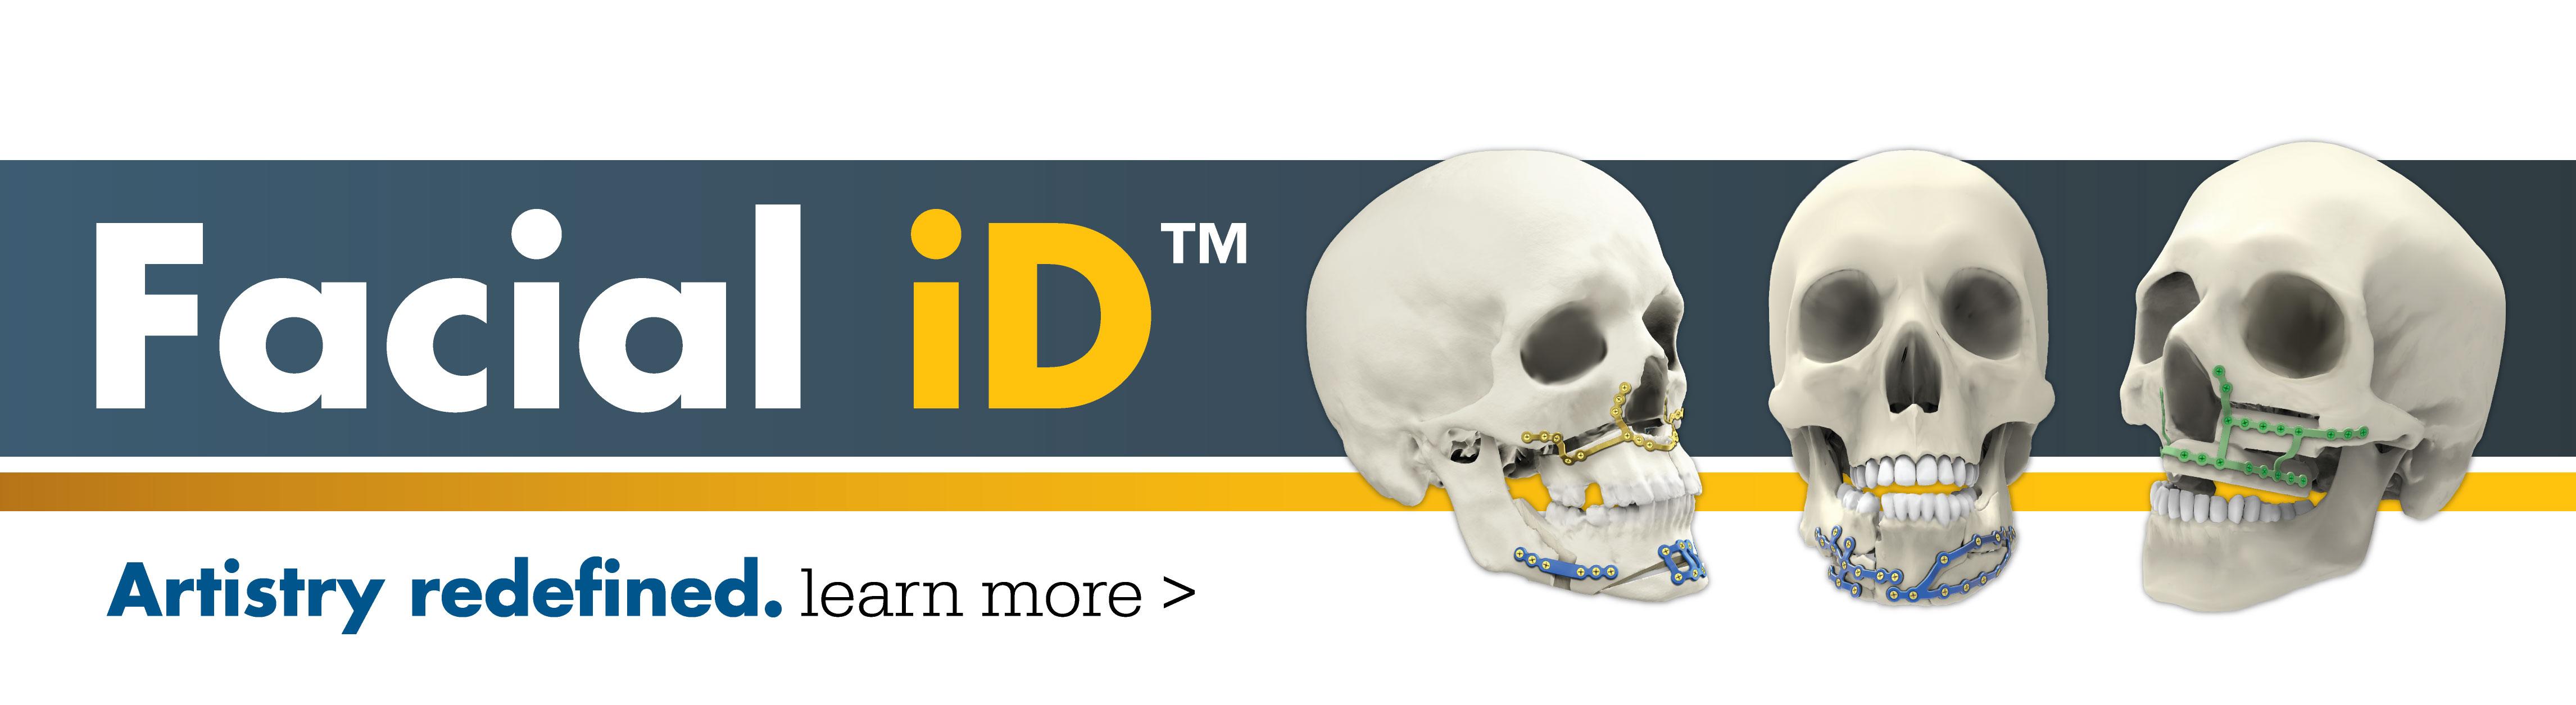 Facial iD banner